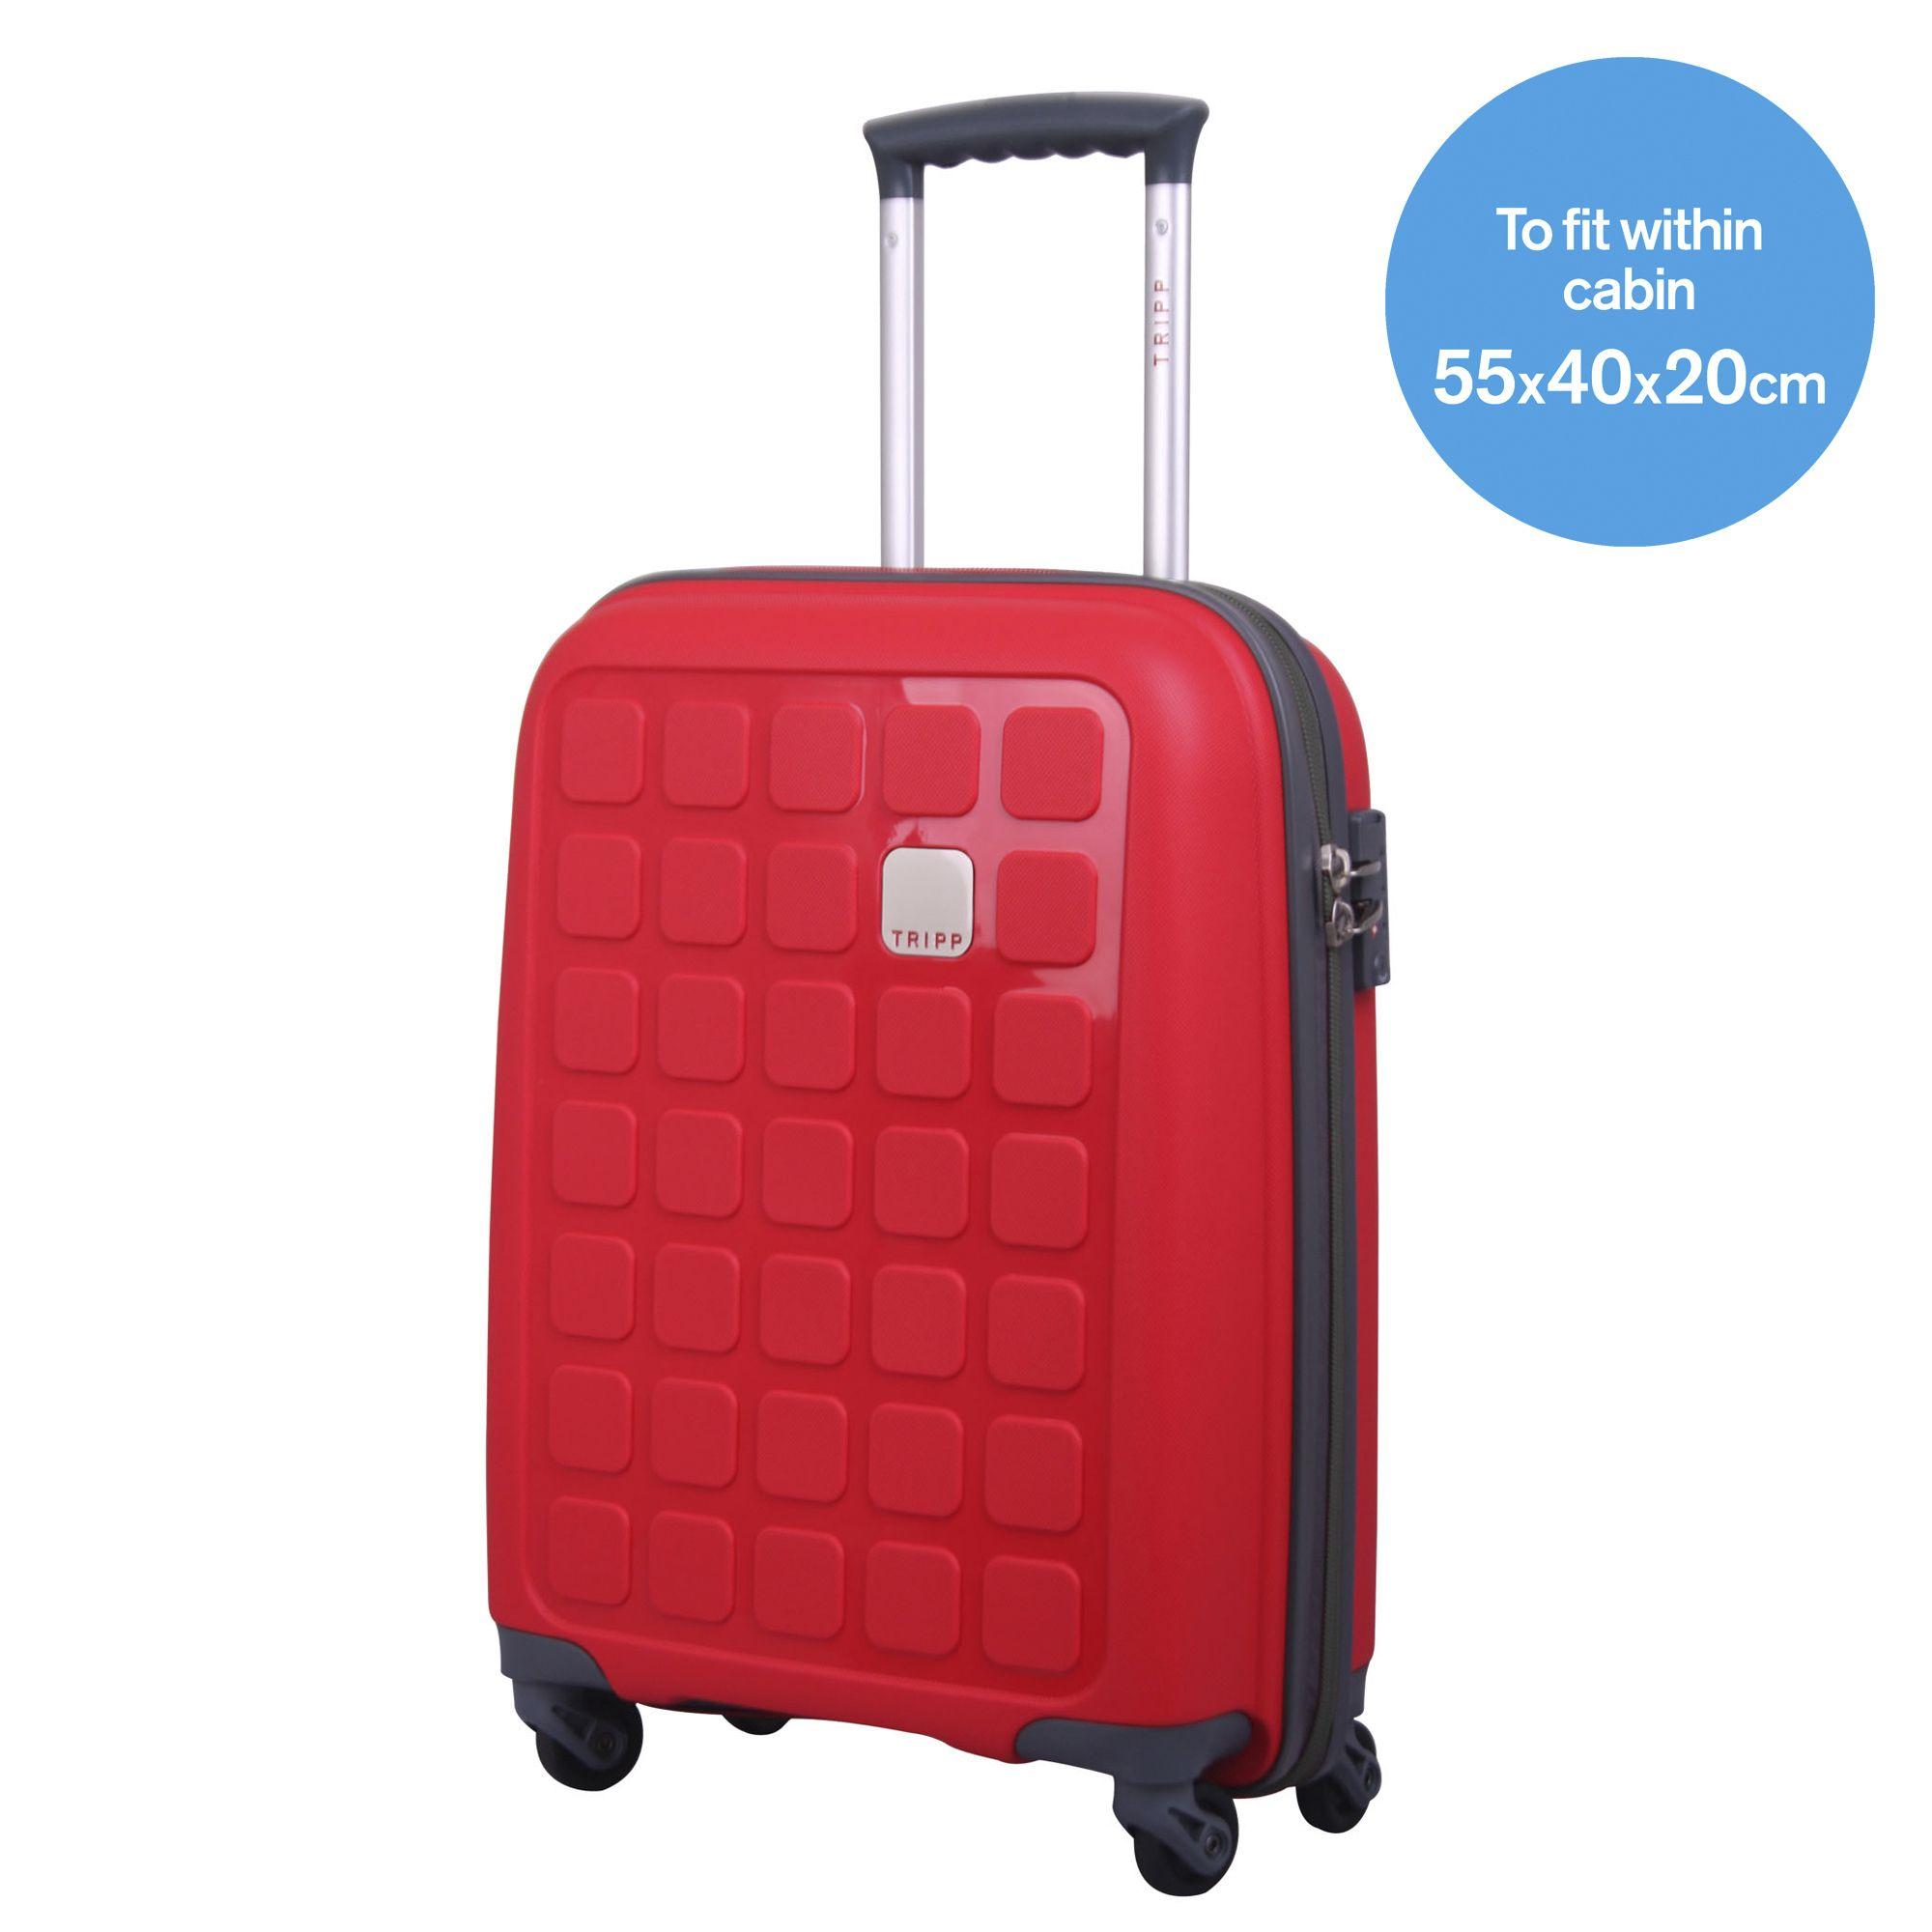 tripp poppy ii 39 holiday 5 39 cabin 4 wheel suitcase hard. Black Bedroom Furniture Sets. Home Design Ideas